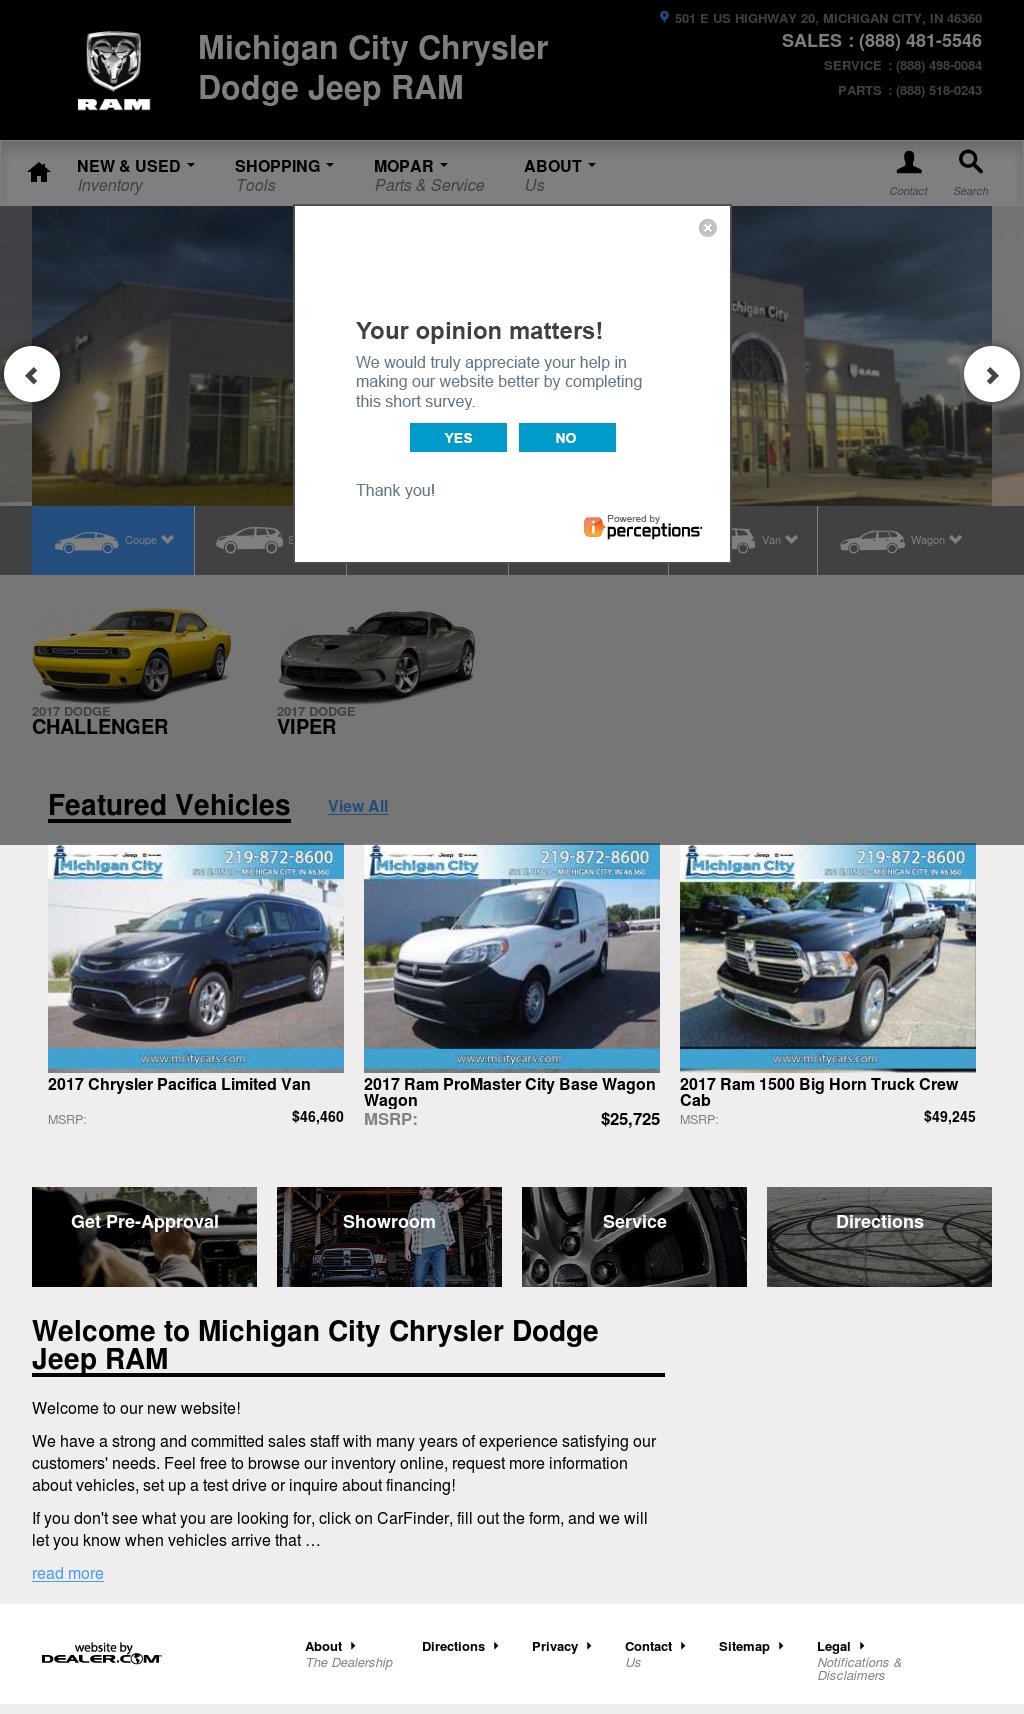 Michigan City Chrysler Dodge Jeep Ram Website History